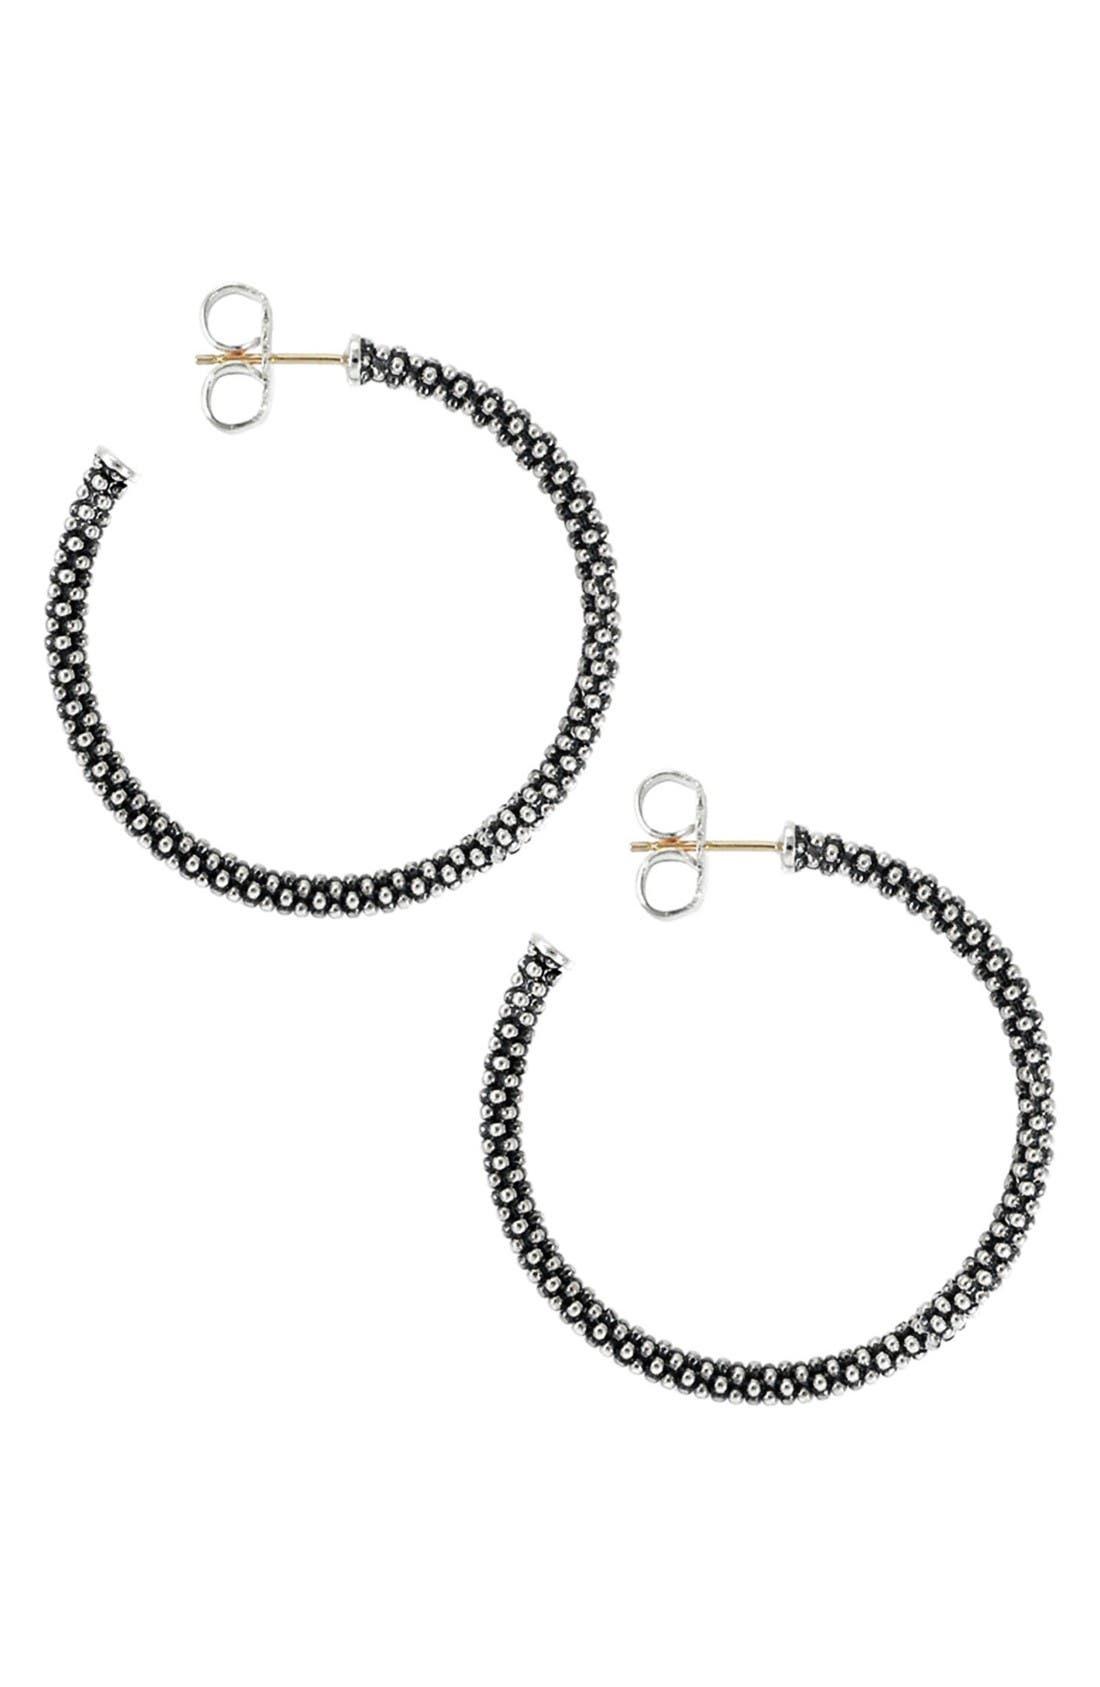 Medium Caviar Hoop Earrings,                             Alternate thumbnail 2, color,                             Sterling Silver